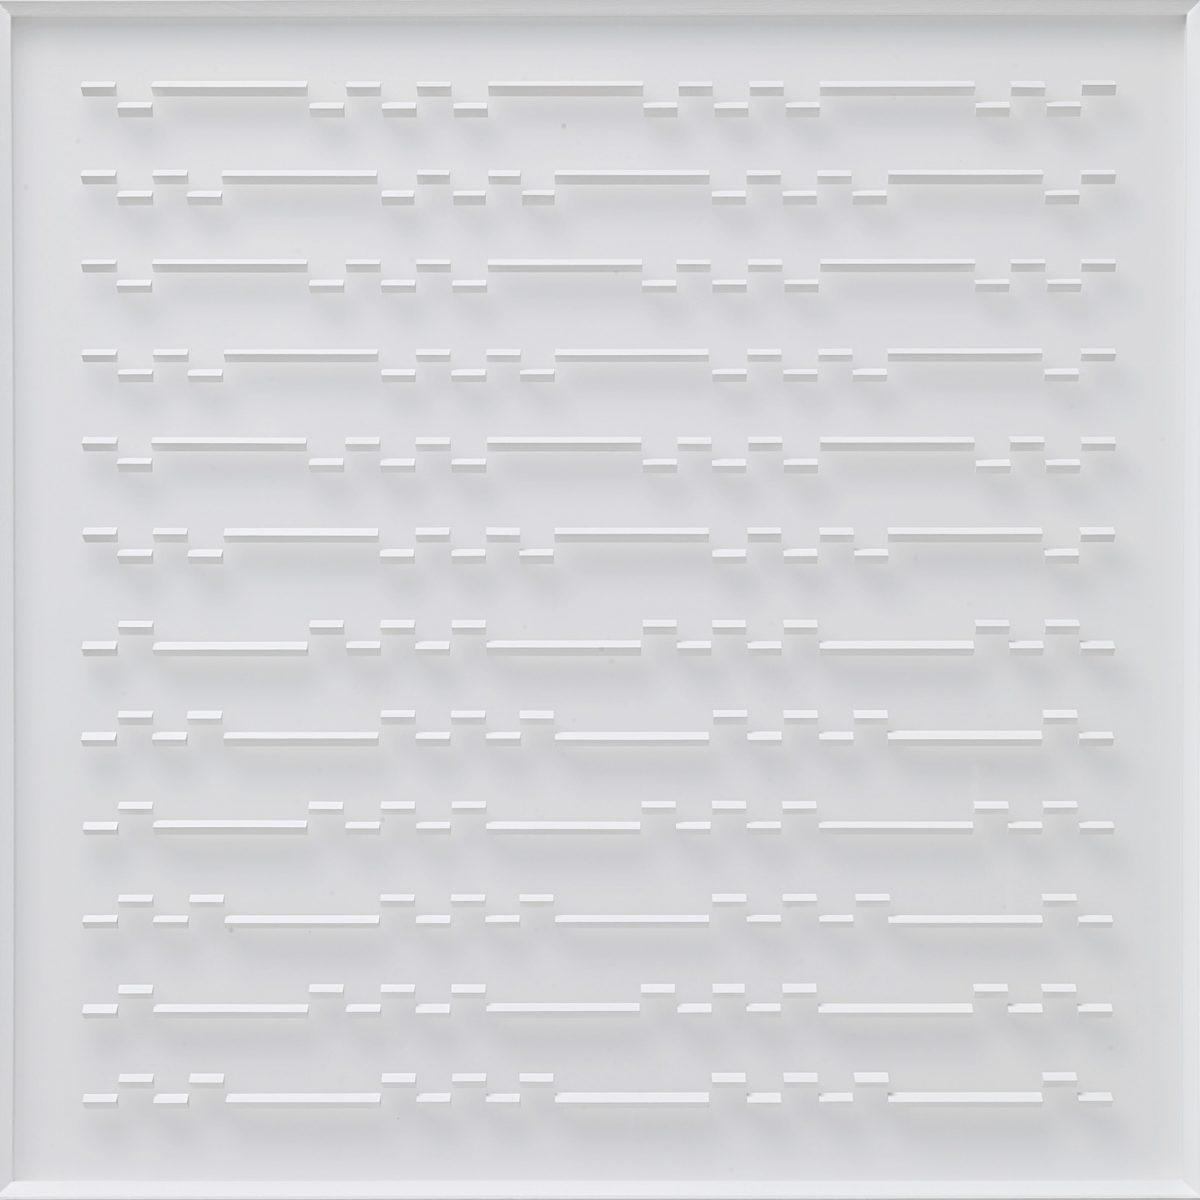 16 Klaus Staudt, Gezeiten, 2014, 85 x 85 x 5,7 cm, Holz, Acrylfarbe, Plexiglas; Foto: Norbert Miguletz